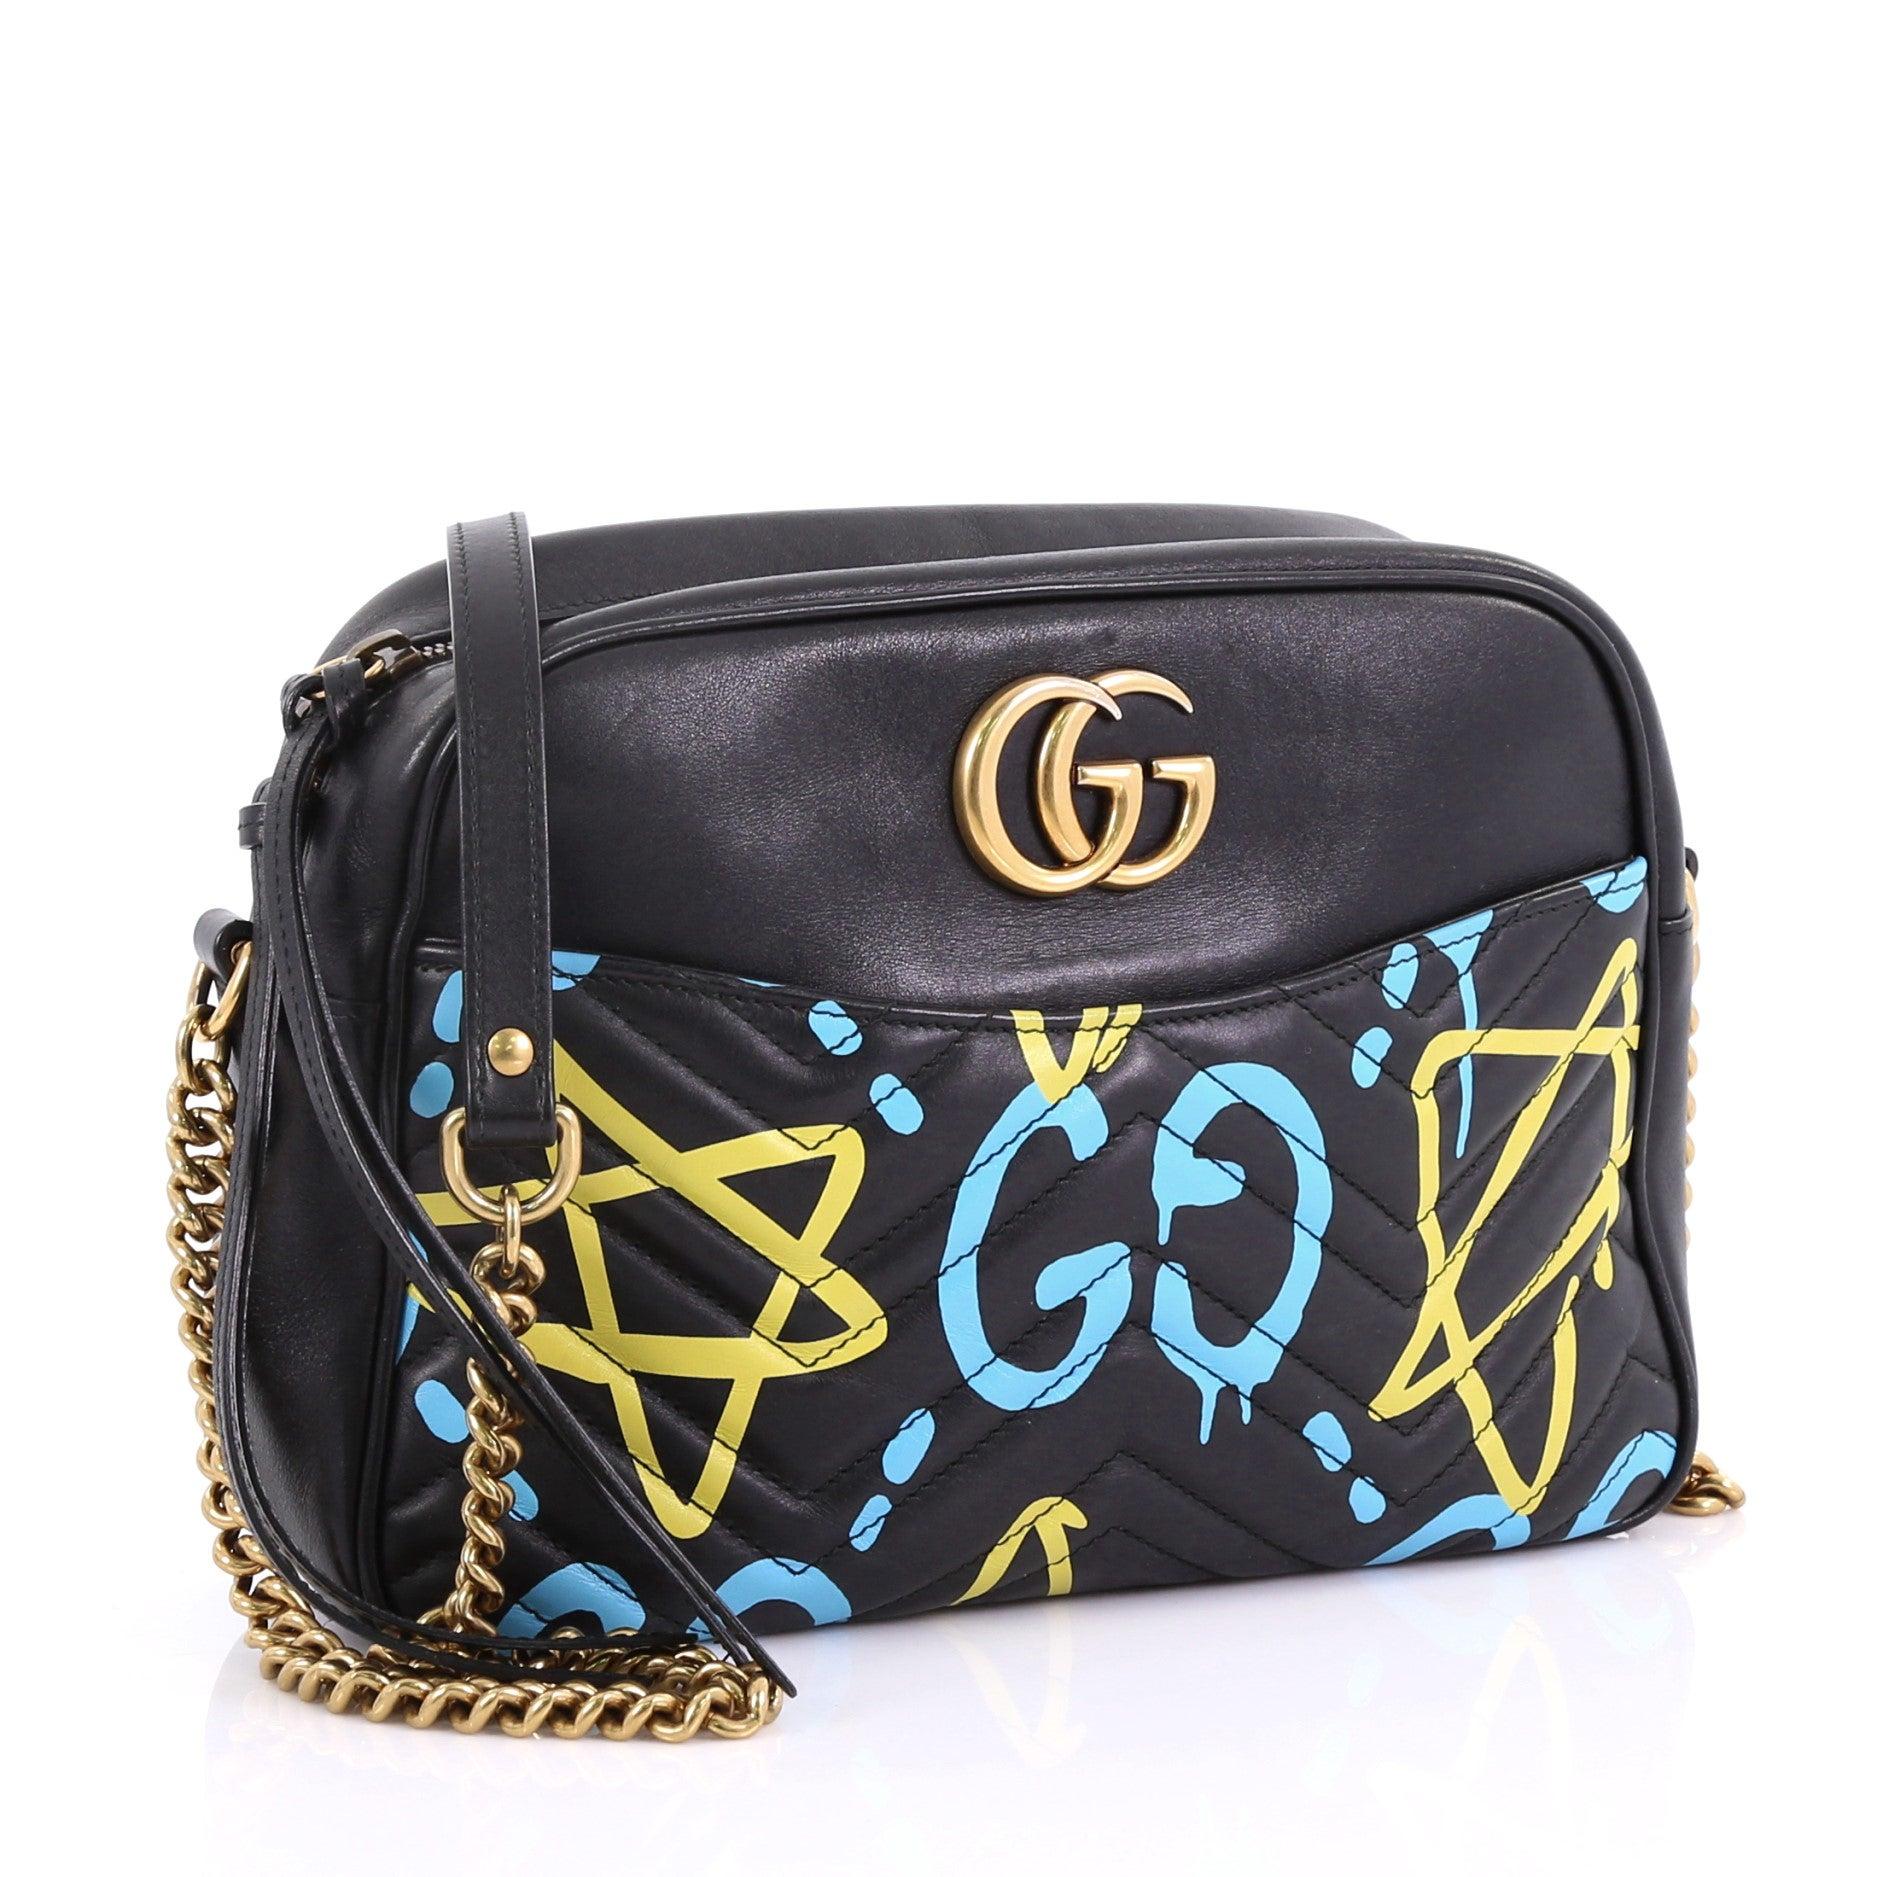 e63b88c27476c8 Gucci GG Marmont Shoulder Bag GucciGhost Matelasse Leather Medium at 1stdibs